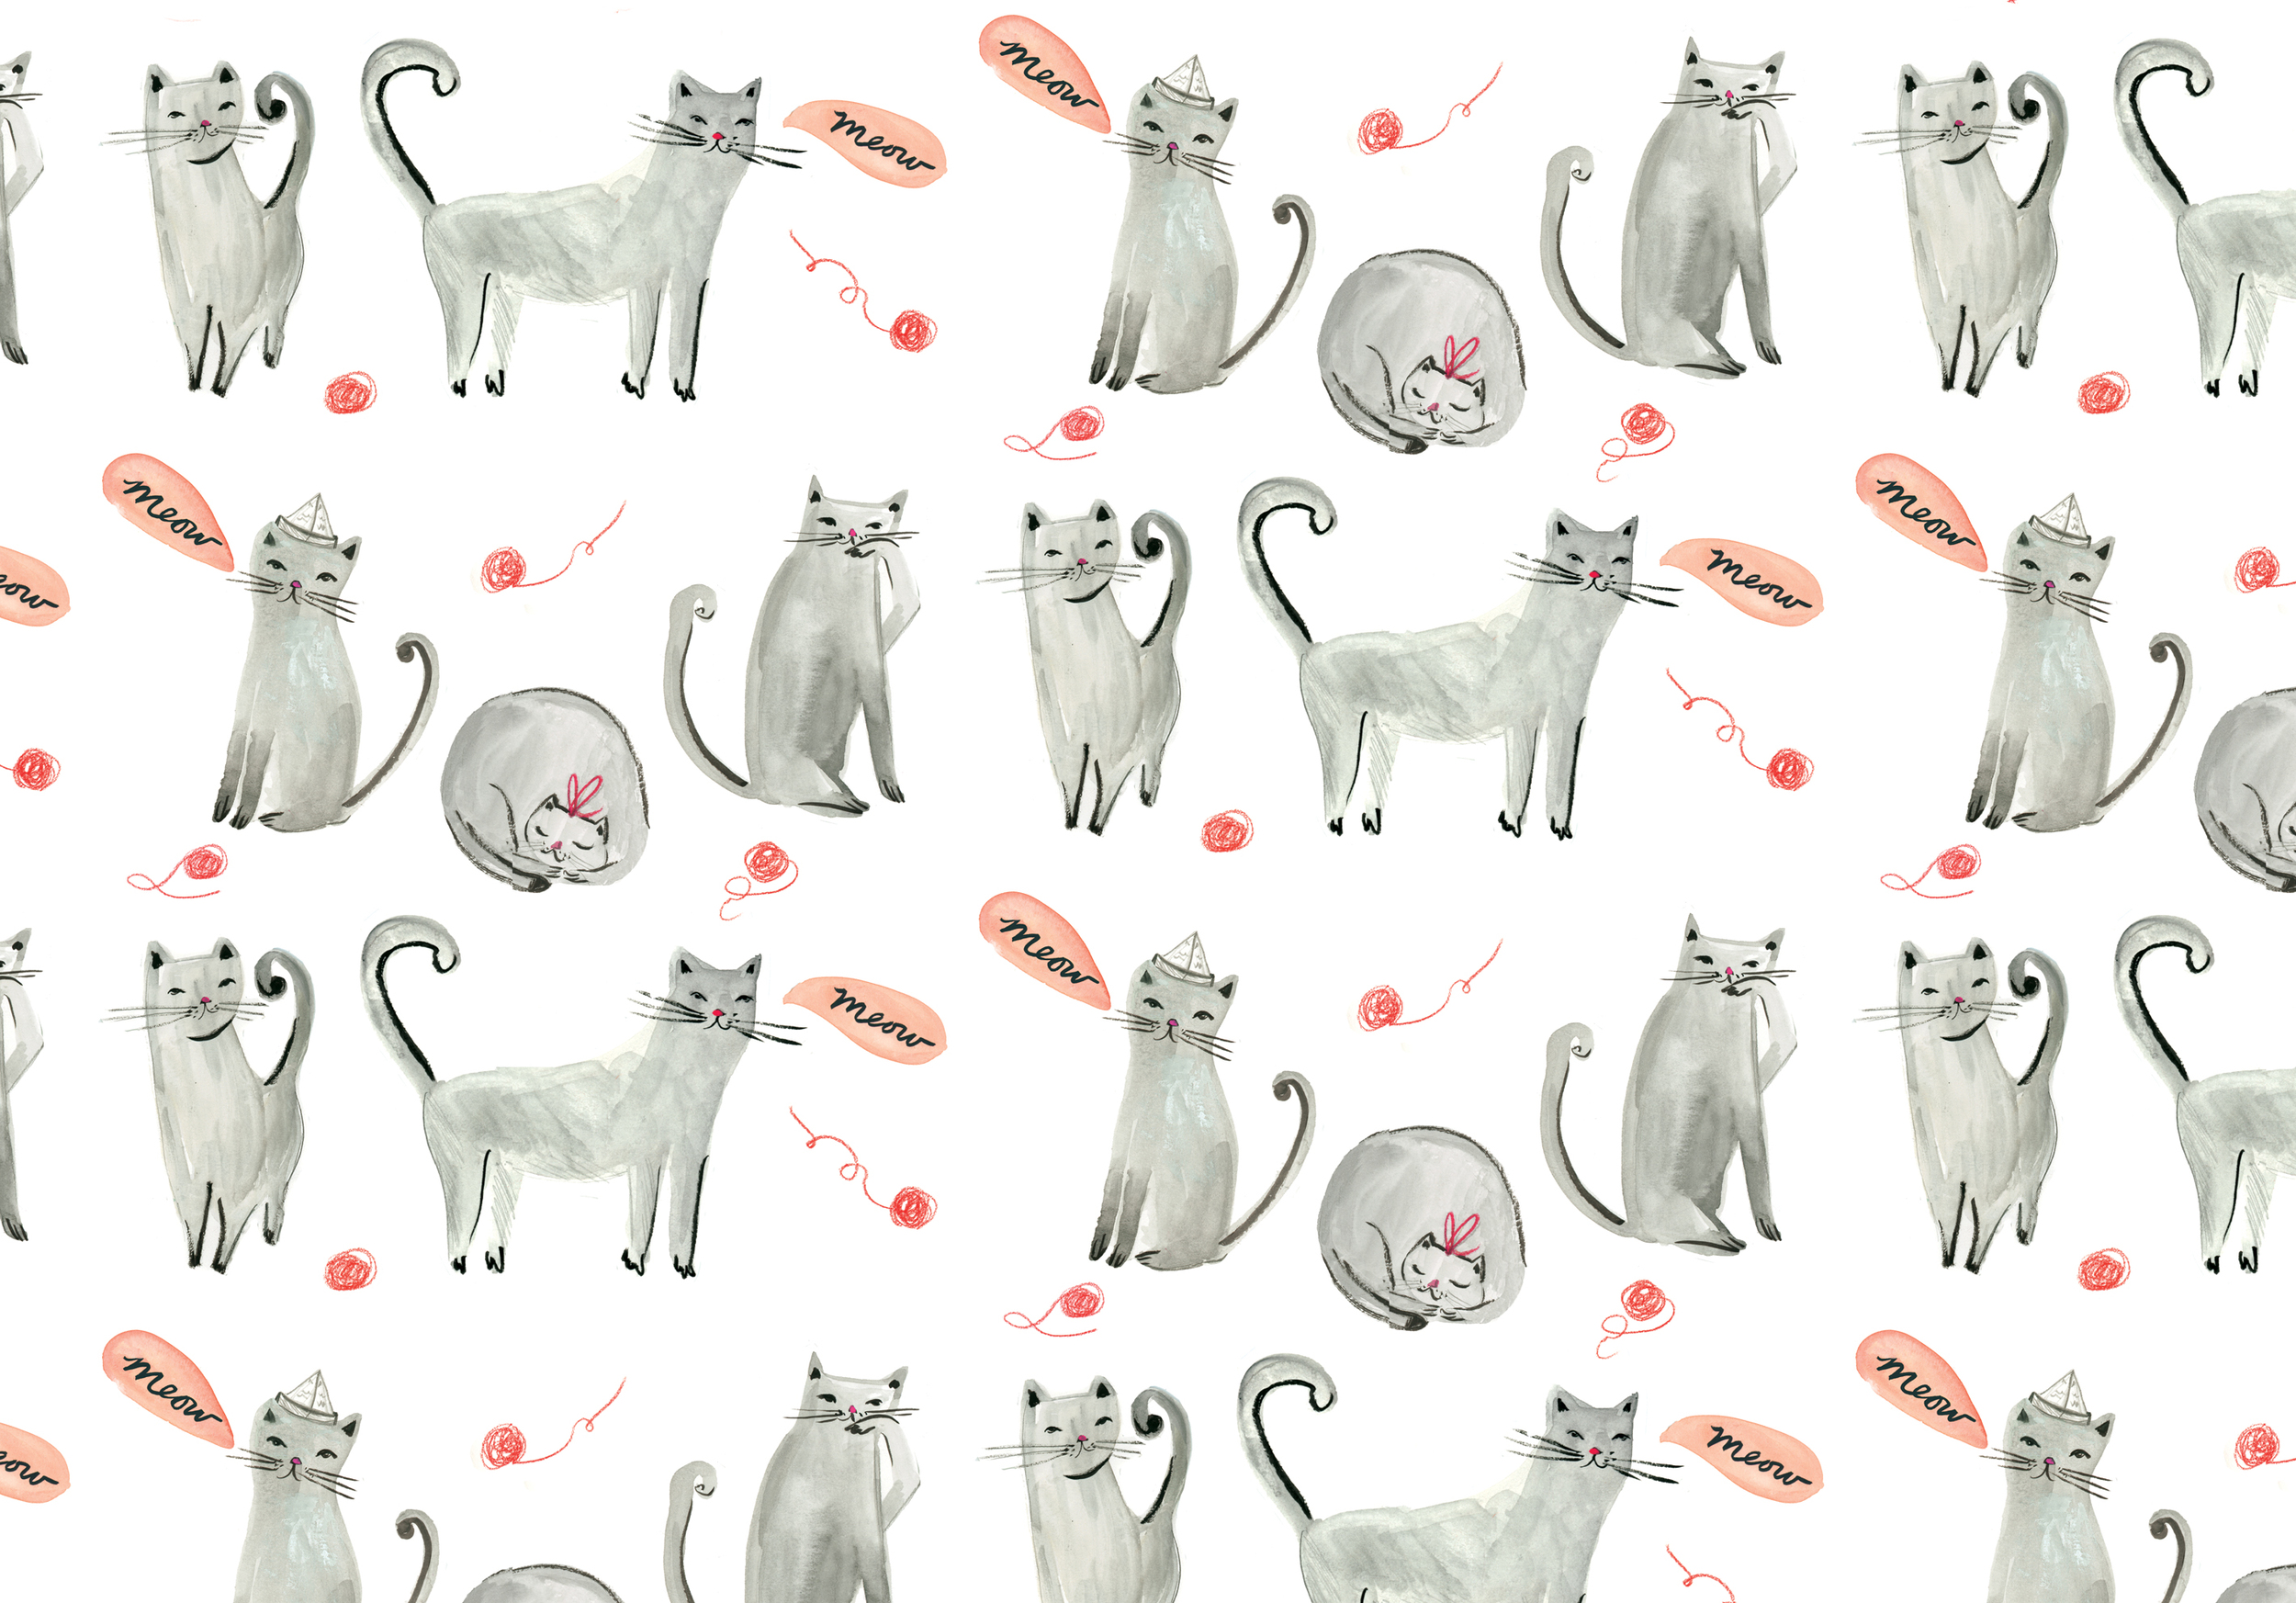 web_new_cat_pattern_2.jpg